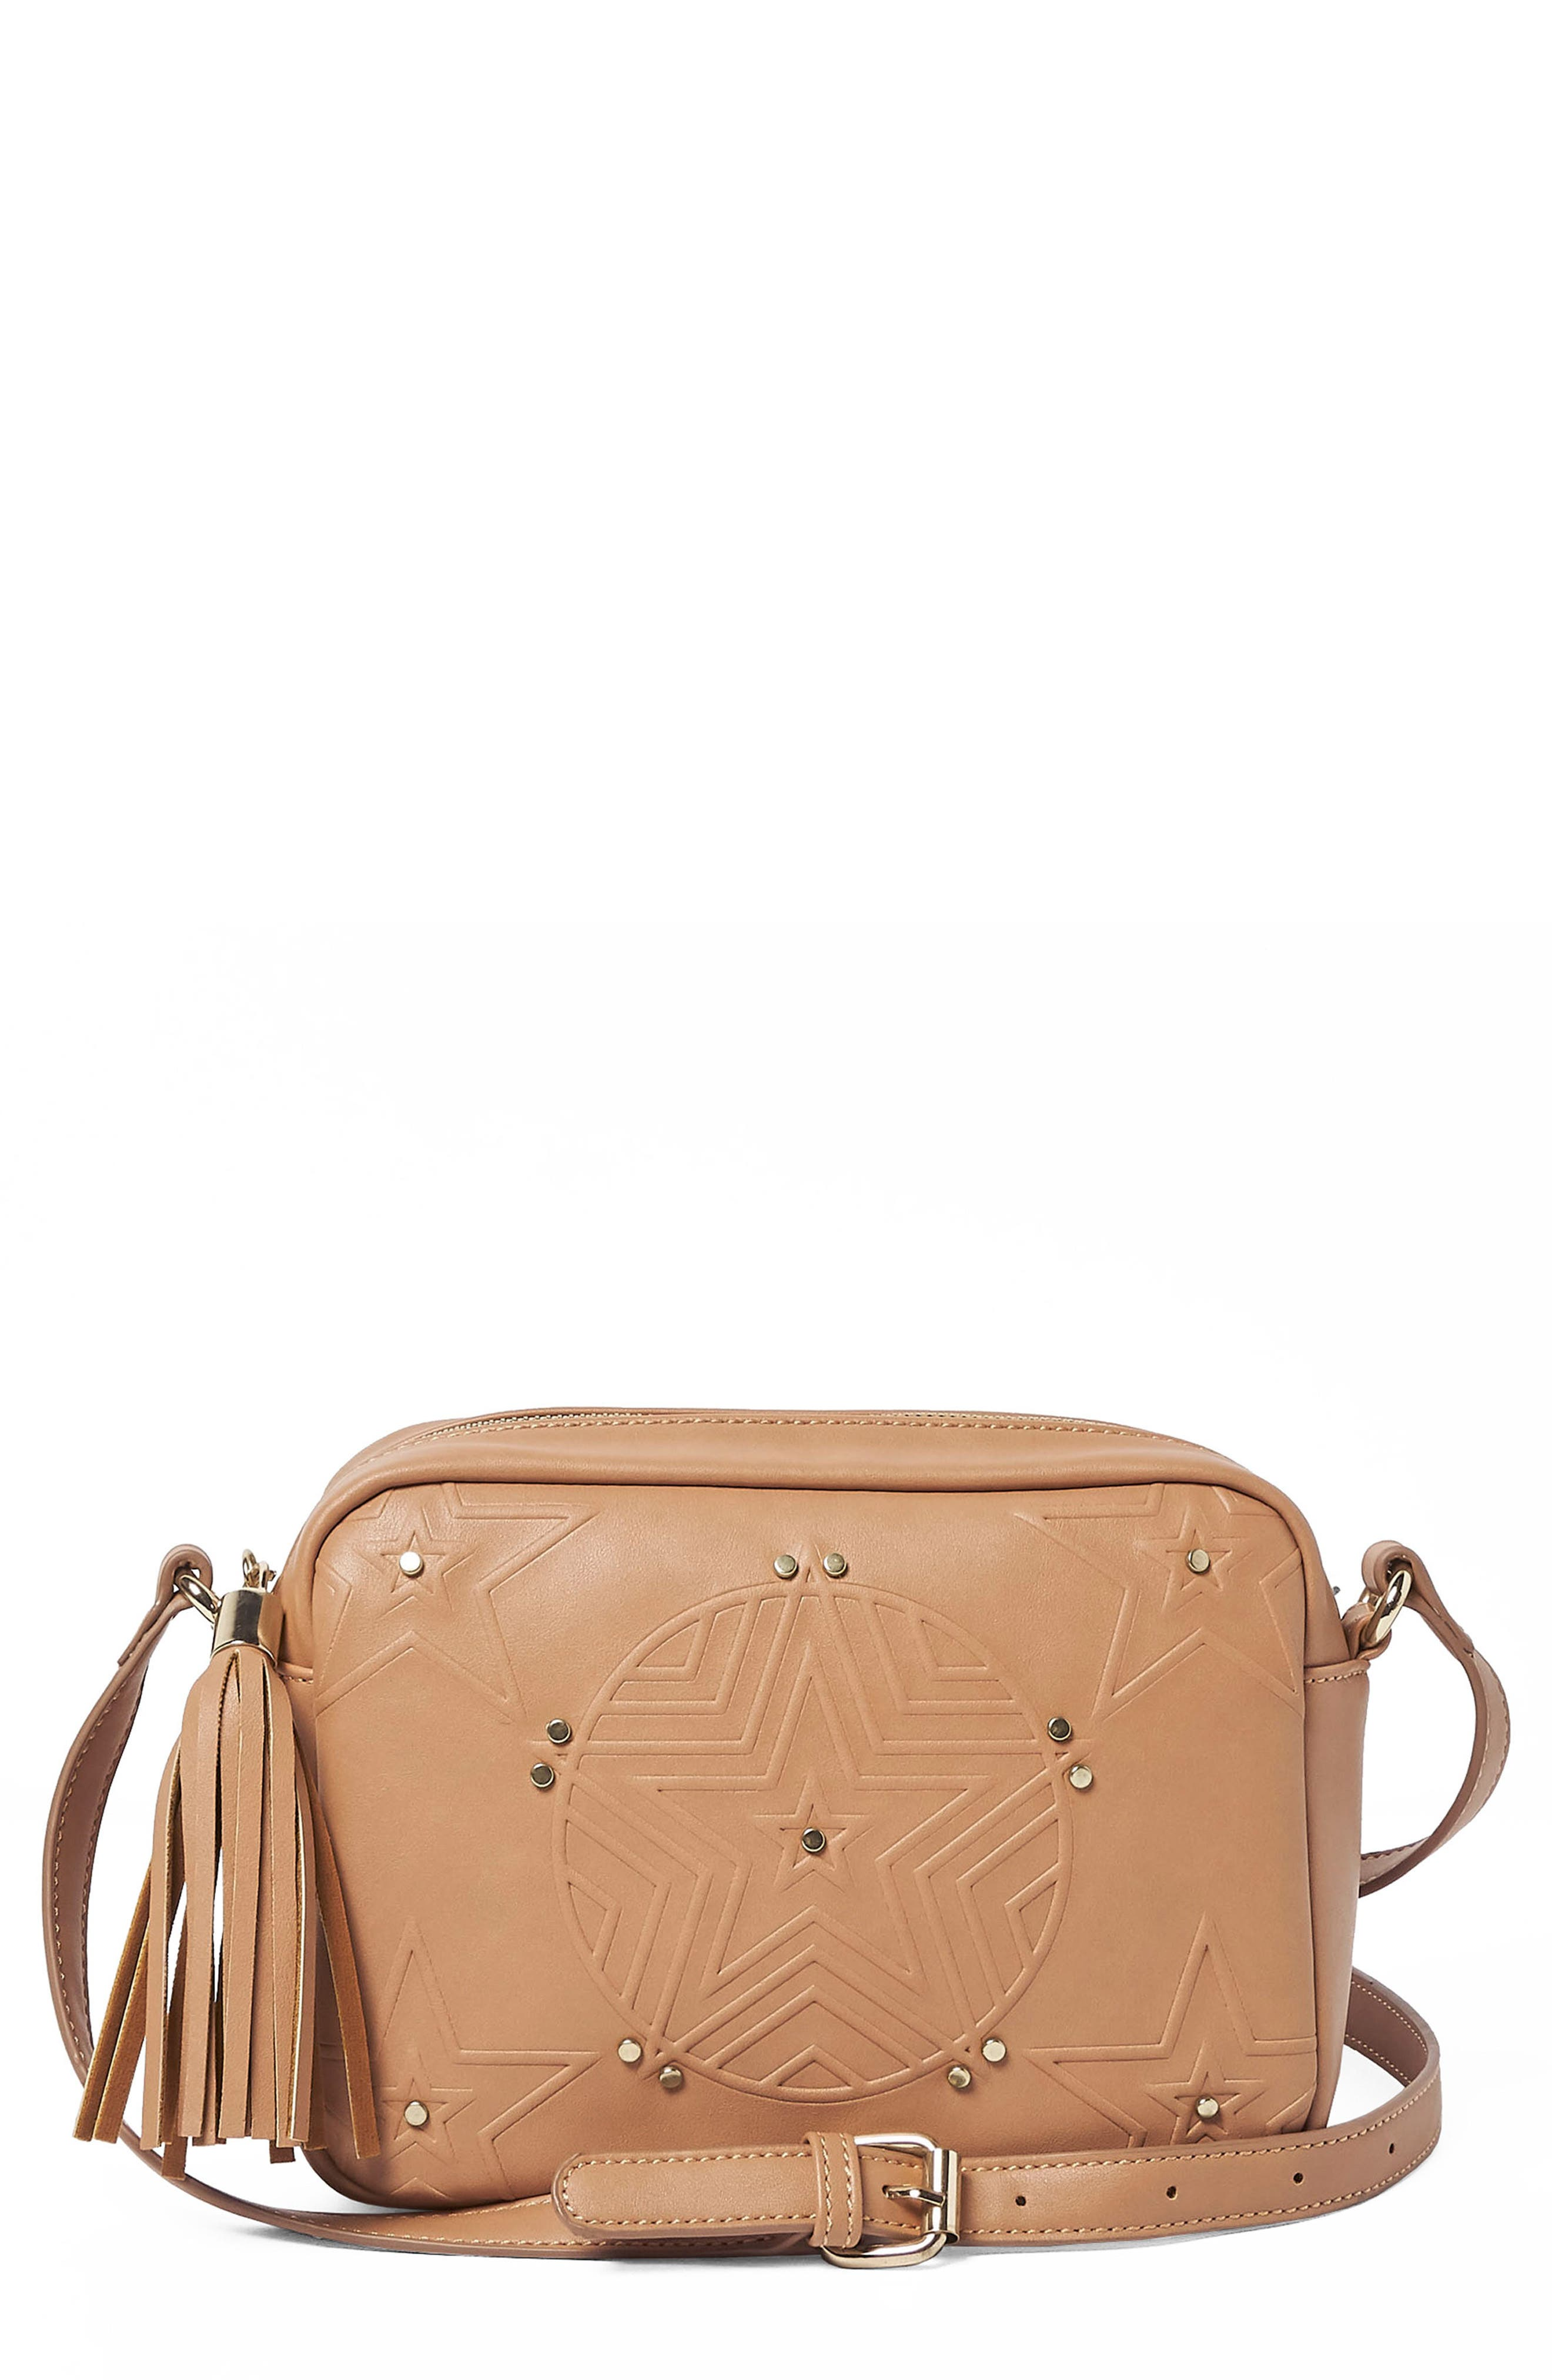 Urban Originals Stargazer Vegan Leather Crossbody Bag